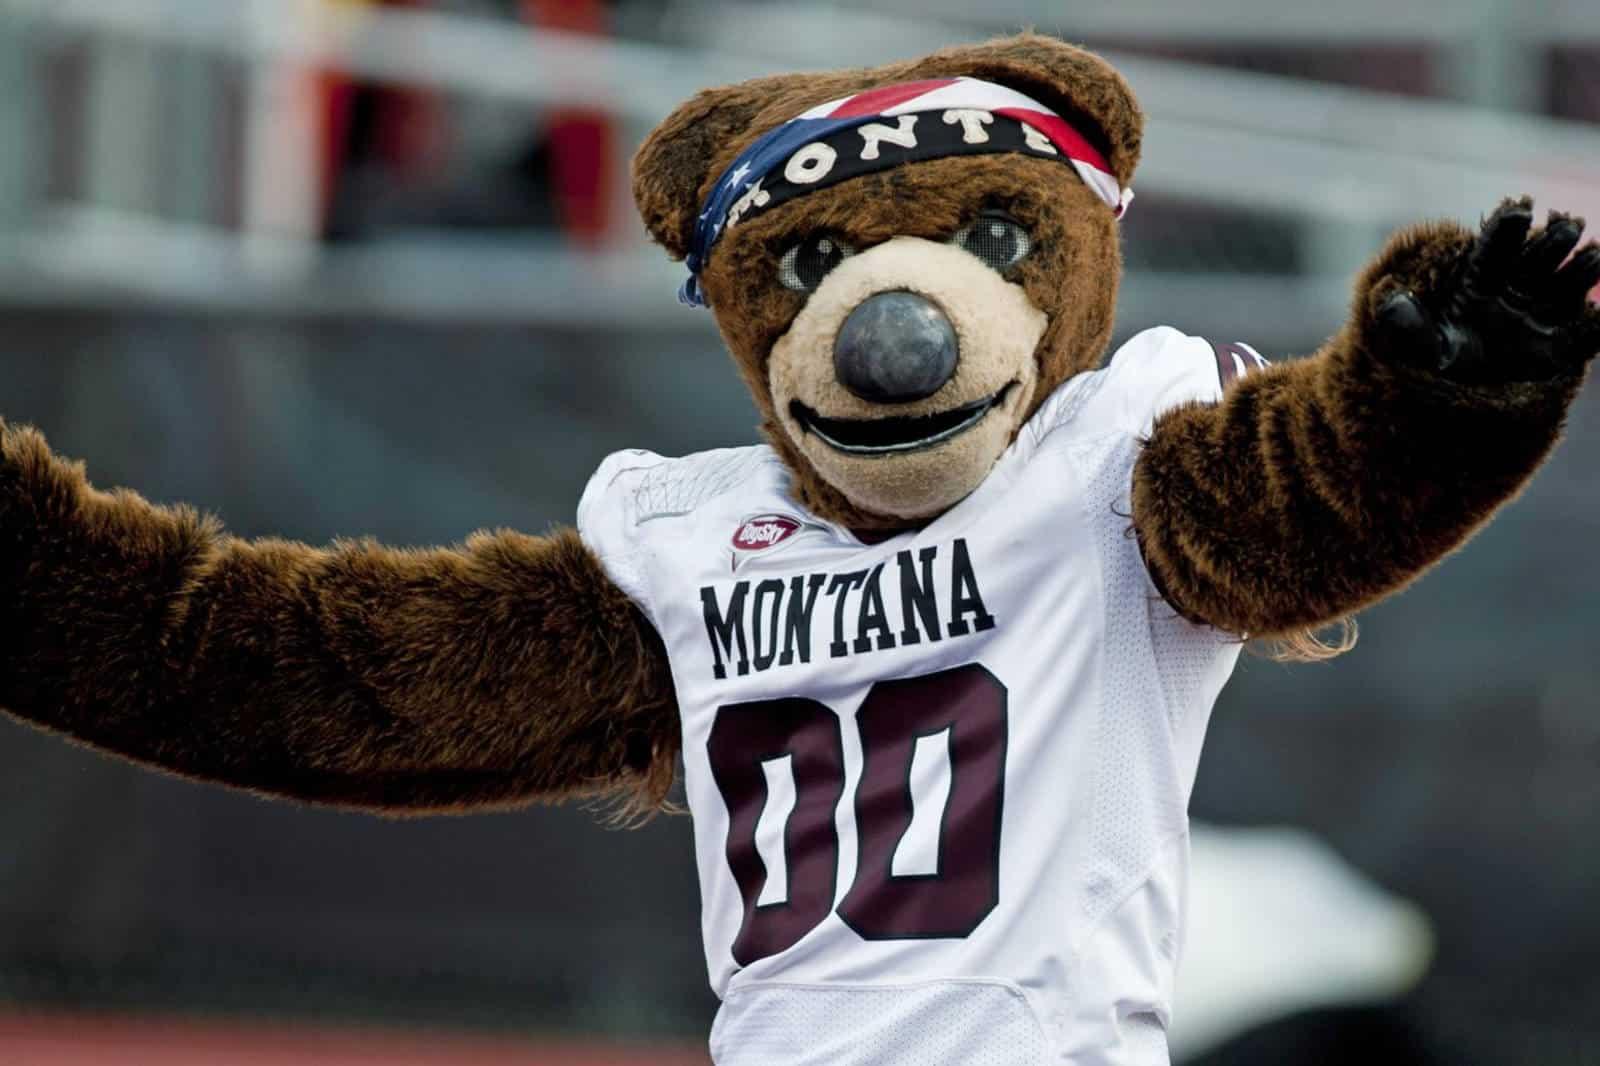 Montana Mascot Monte